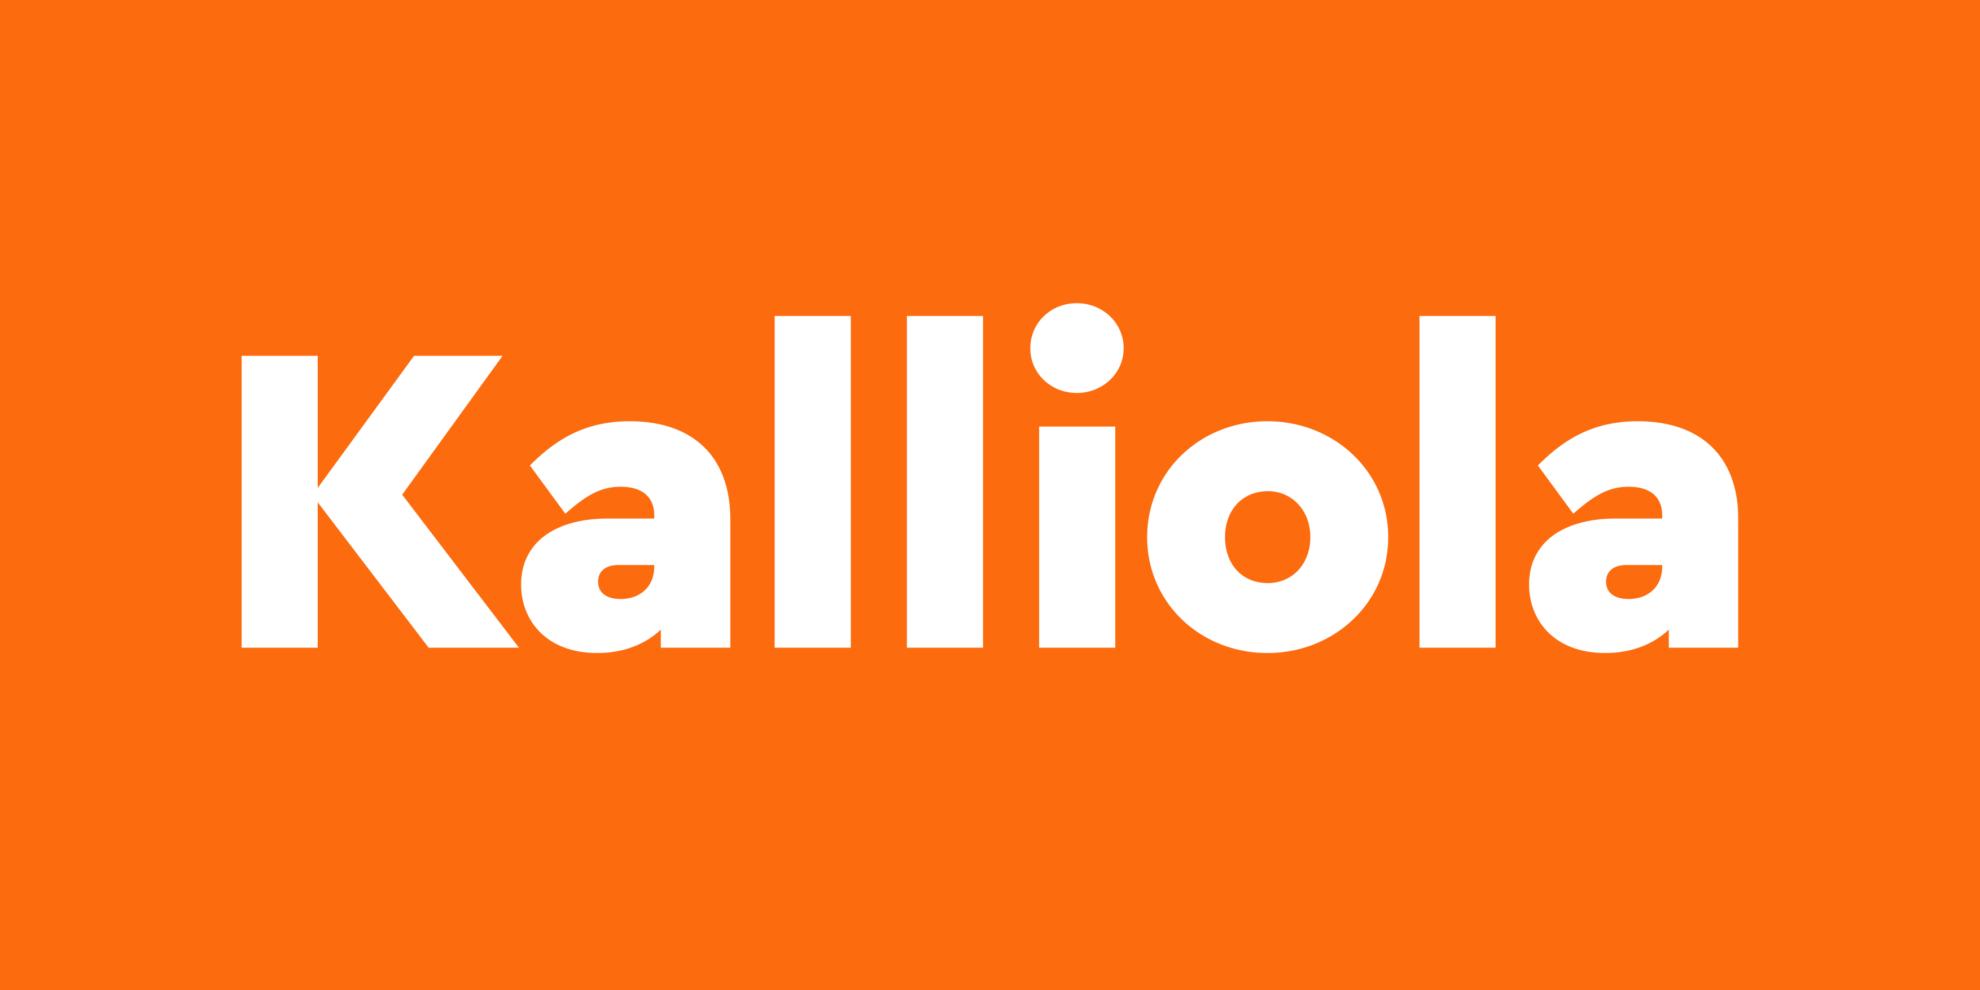 Kalliola logo